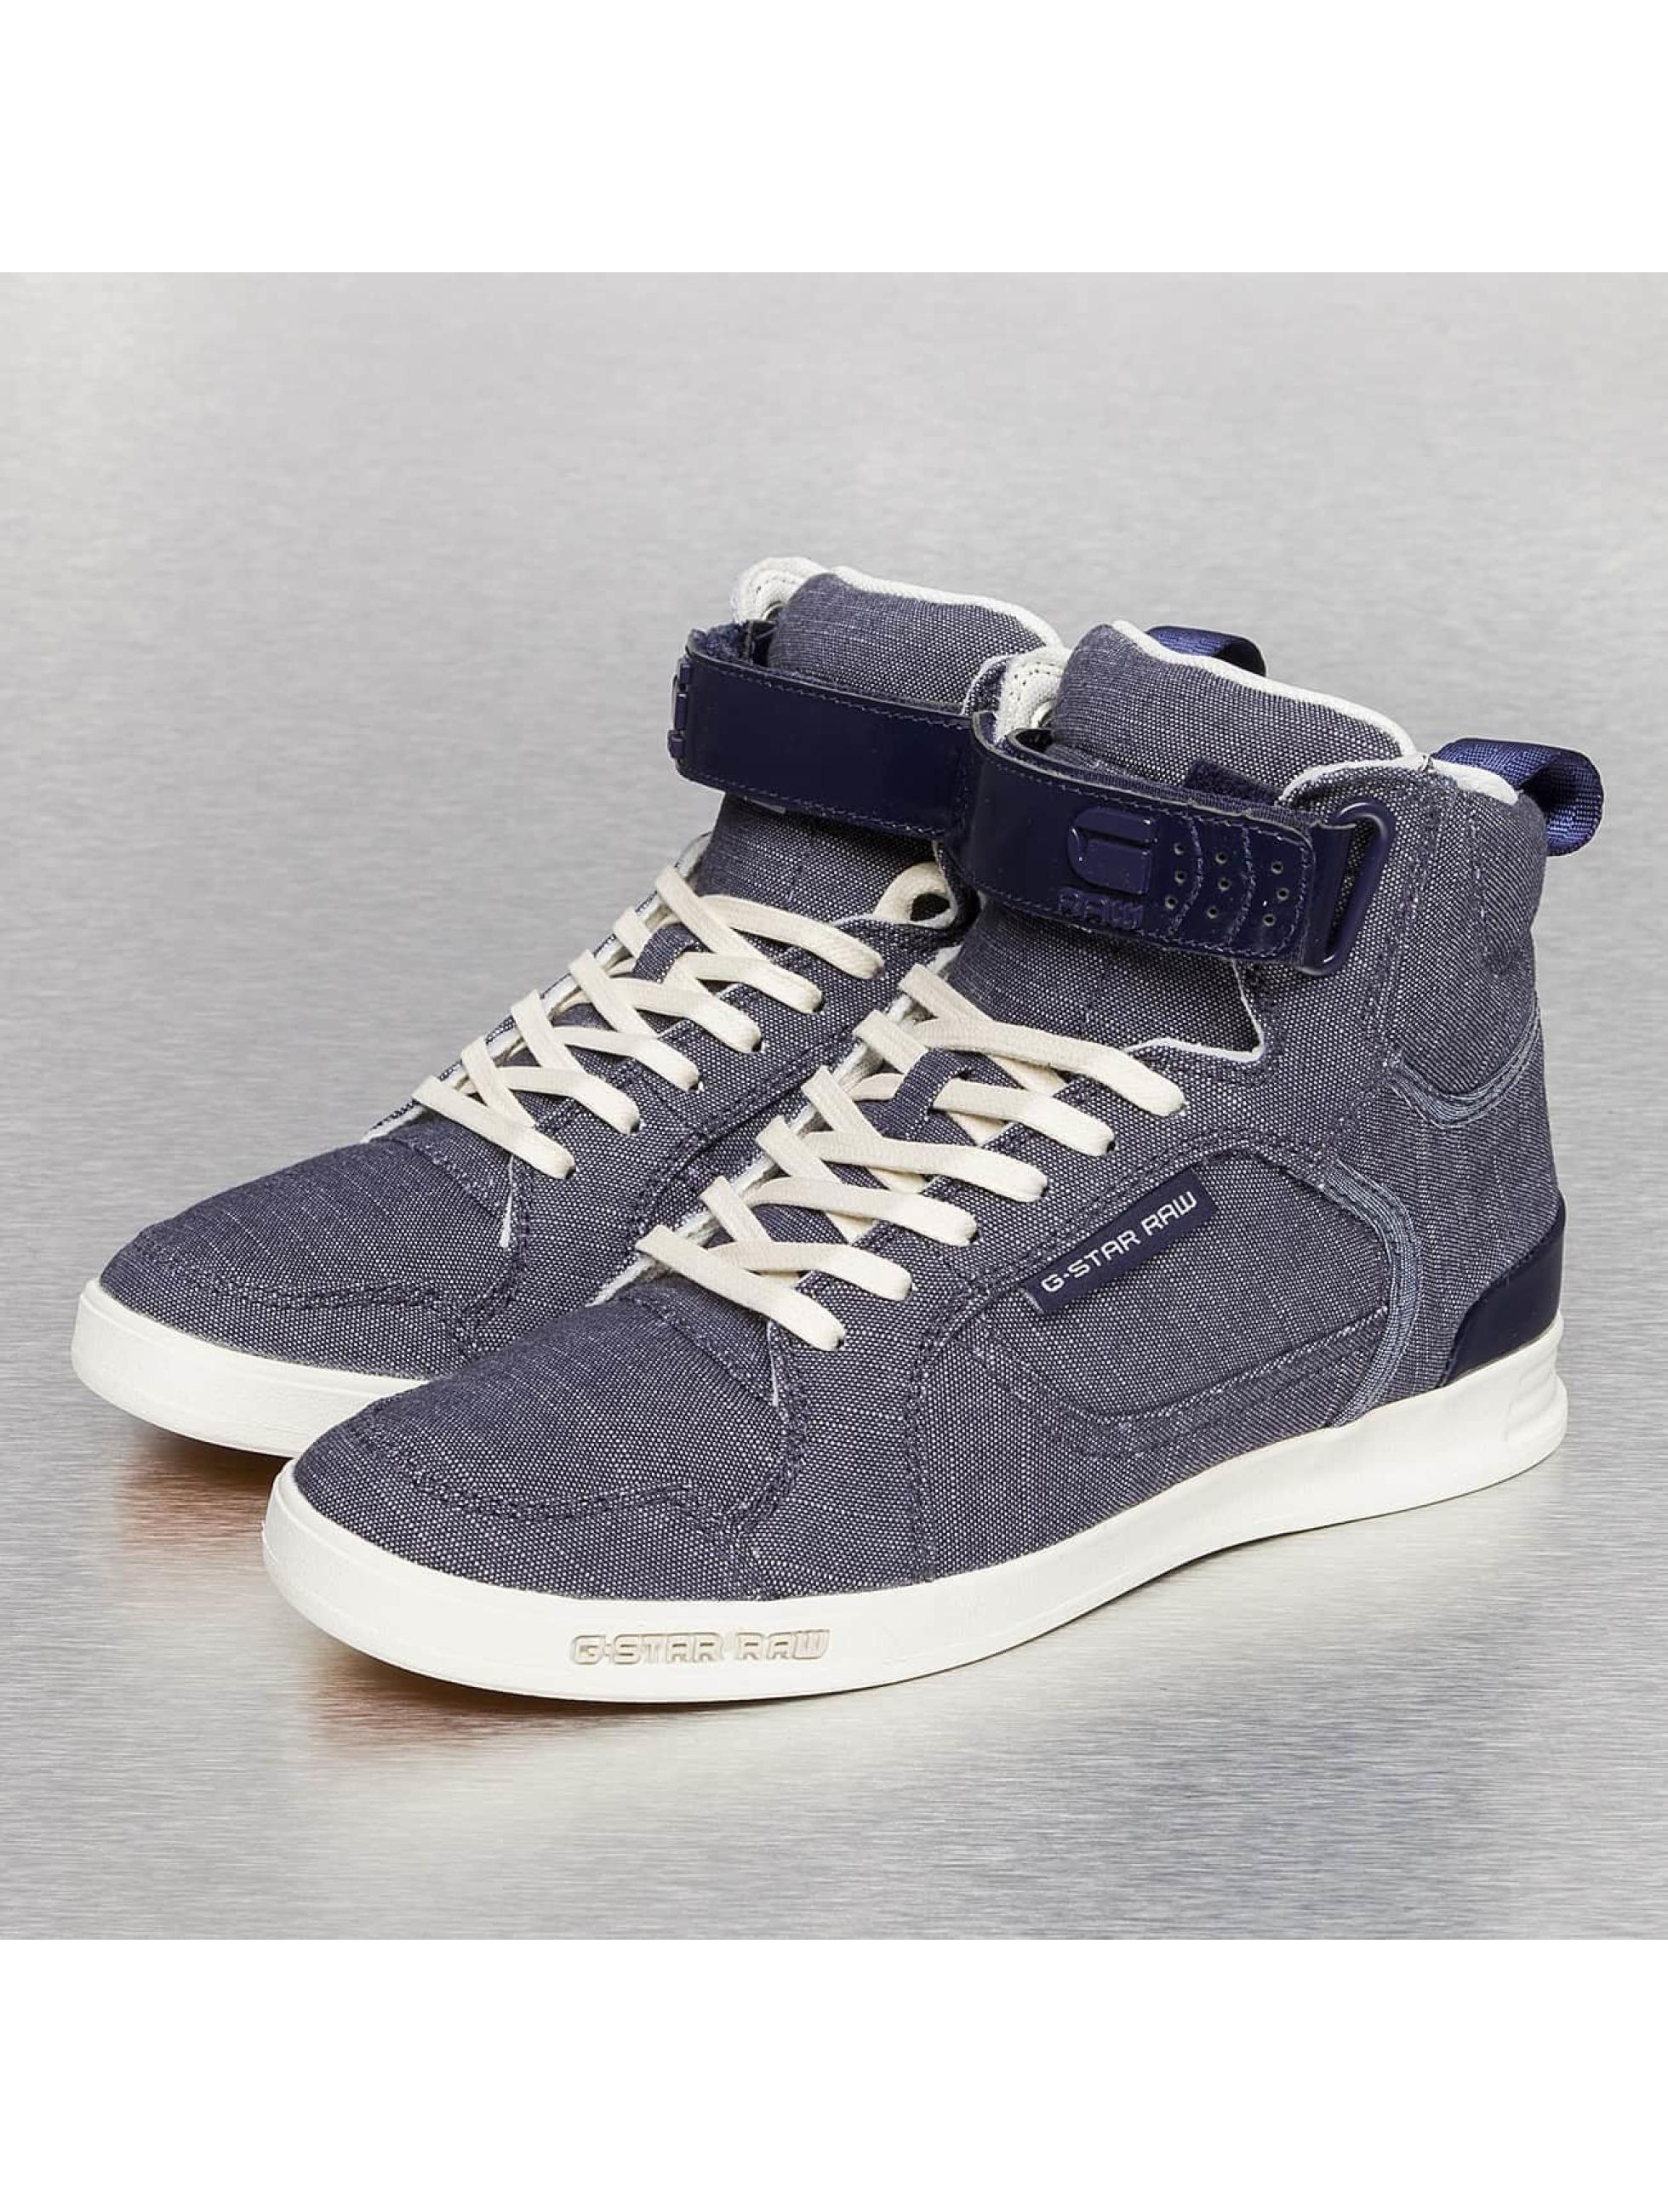 g star footwear damen sneaker yield in blau 237898. Black Bedroom Furniture Sets. Home Design Ideas